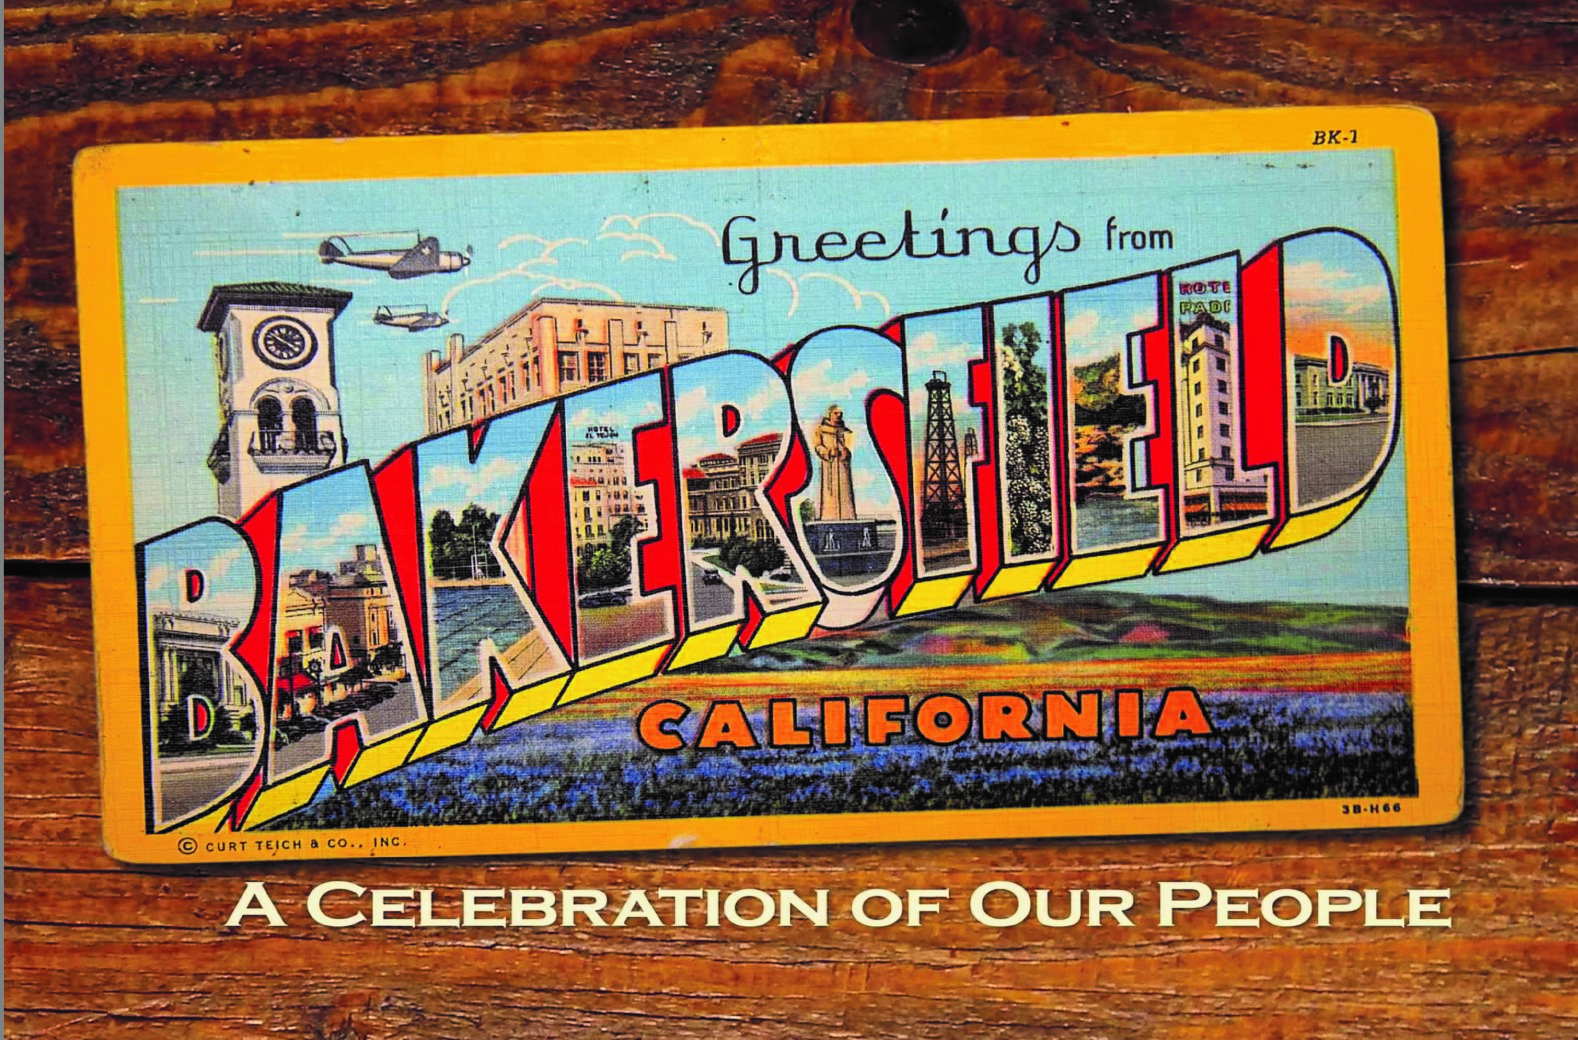 Greetings from Bakersfield cover.jpg